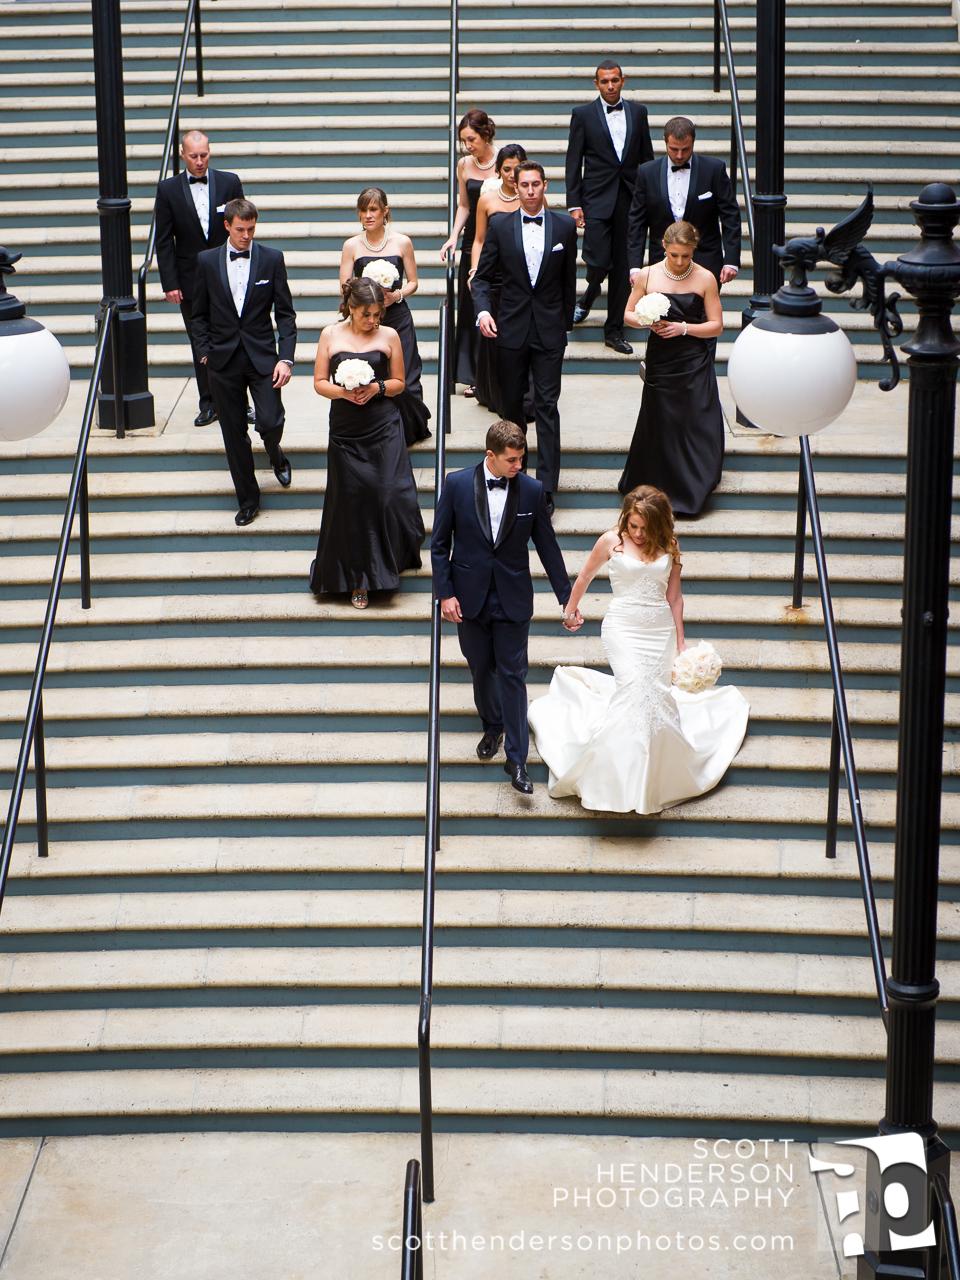 yearinreview-wedding-017.jpg